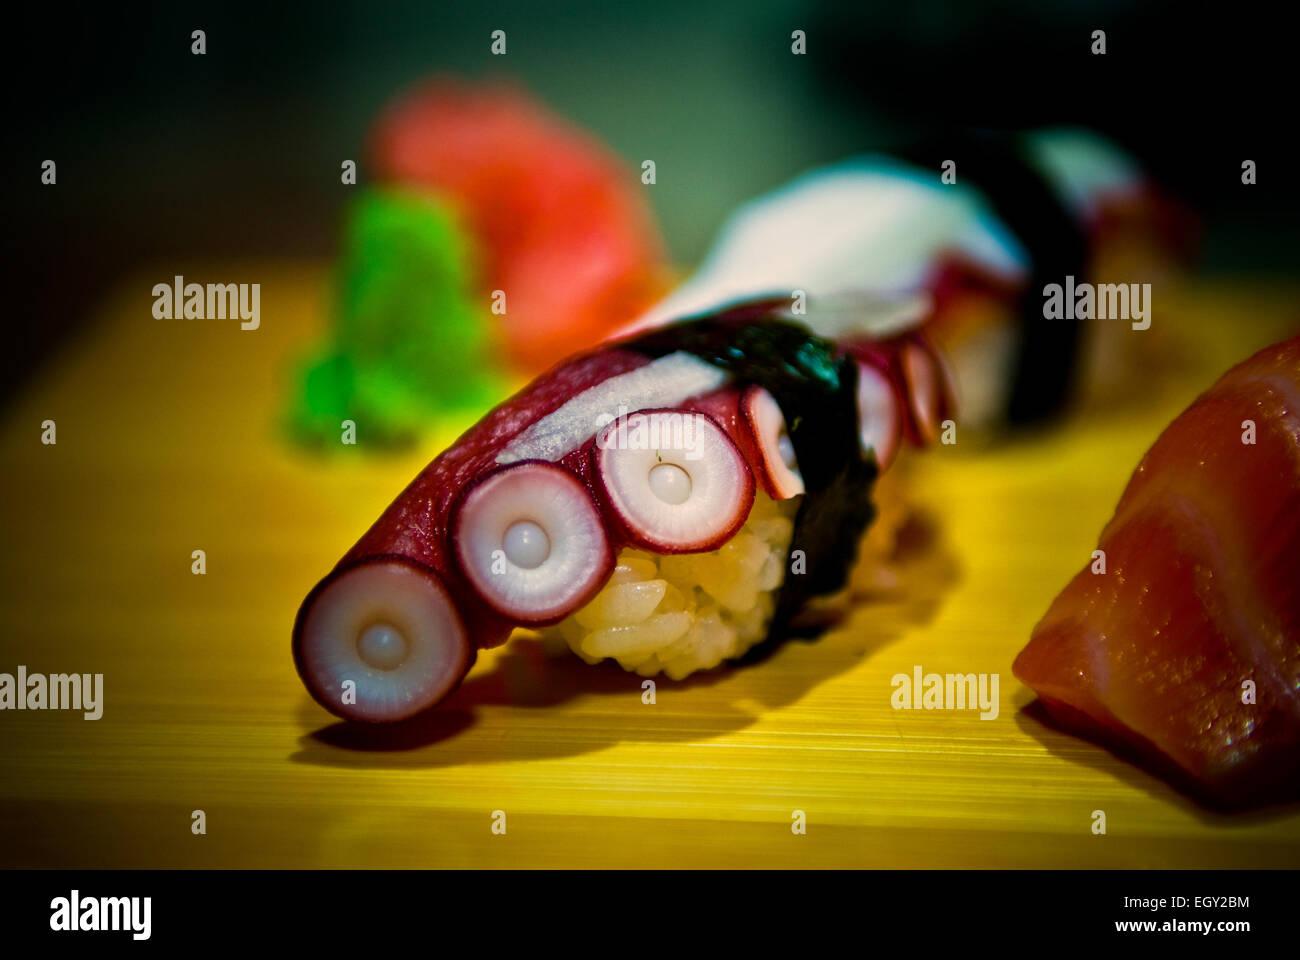 Tako (Oktopus) Sushi-Rolle Stockbild